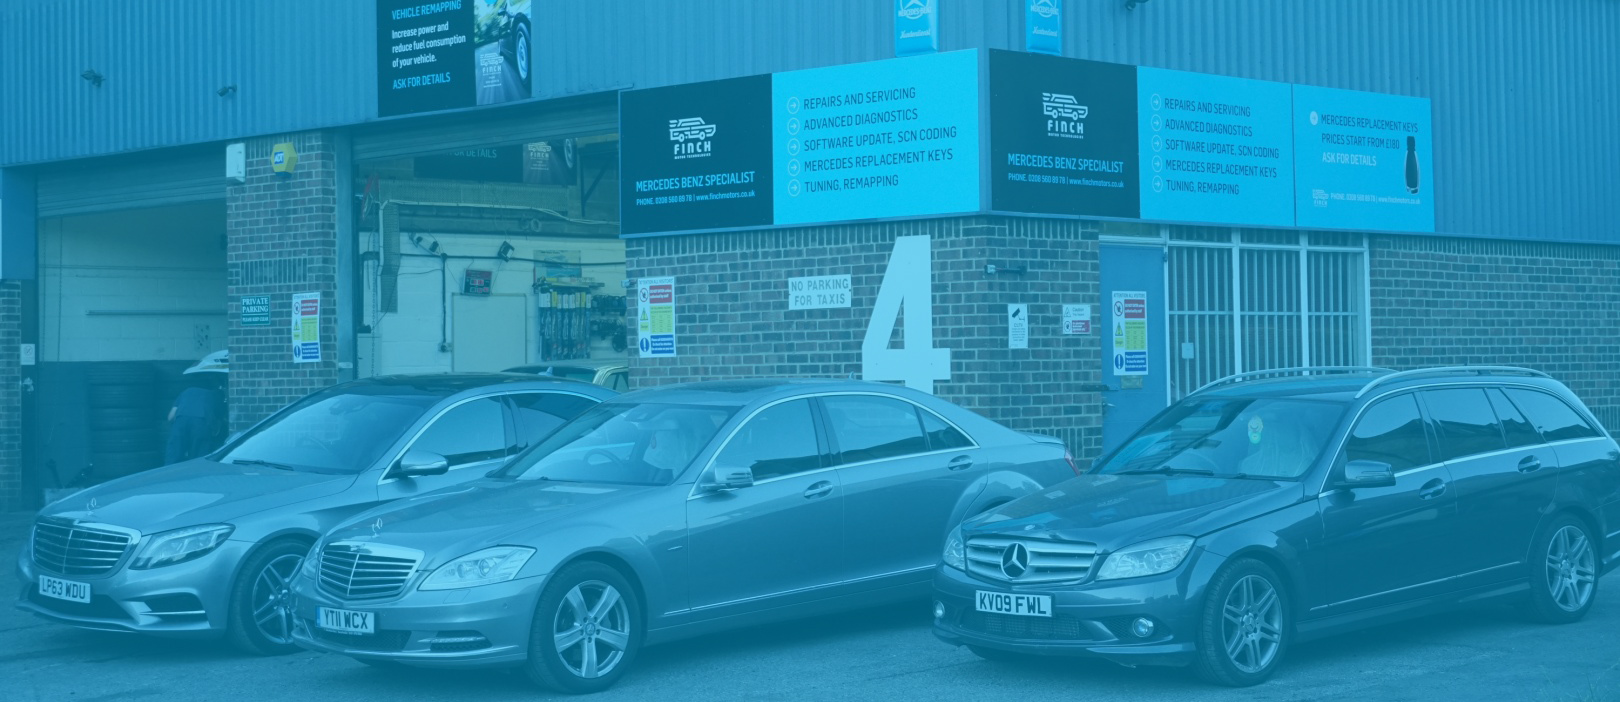 Mercedes Benz Service in Bredfort